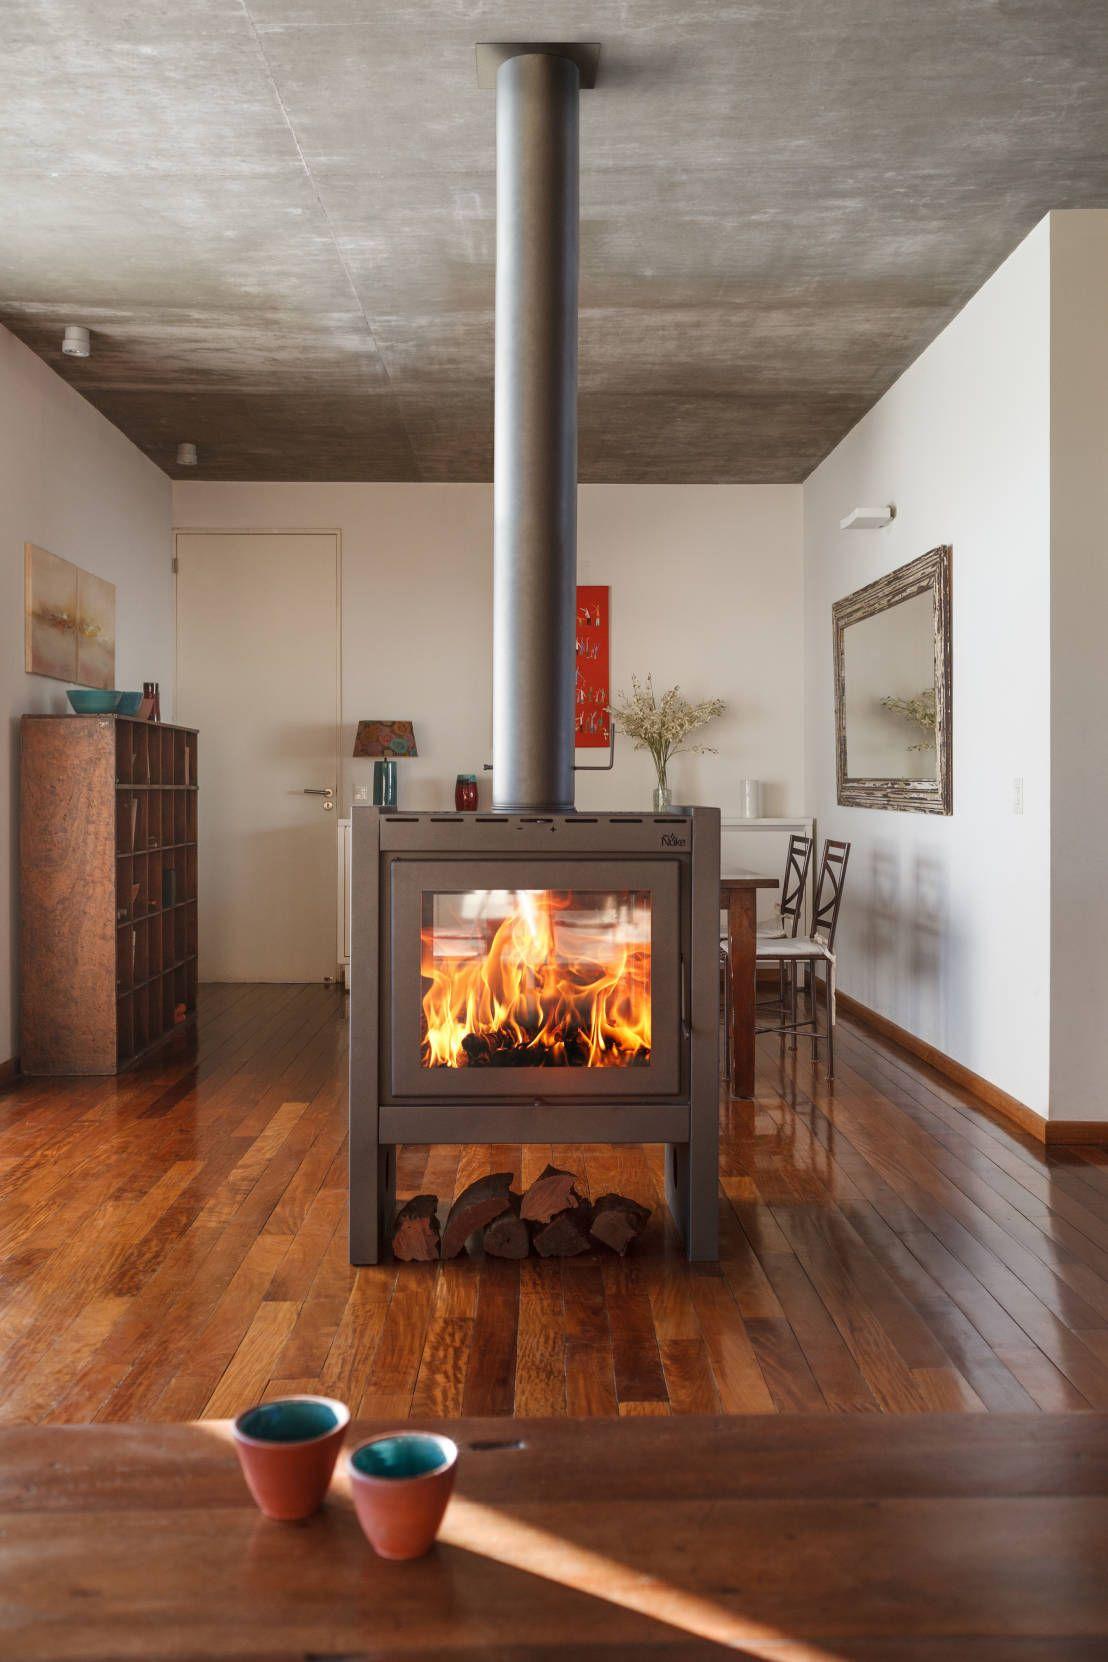 10 chimeneas modernas y espectaculares interiores for Diseno de interiores hogares frescos